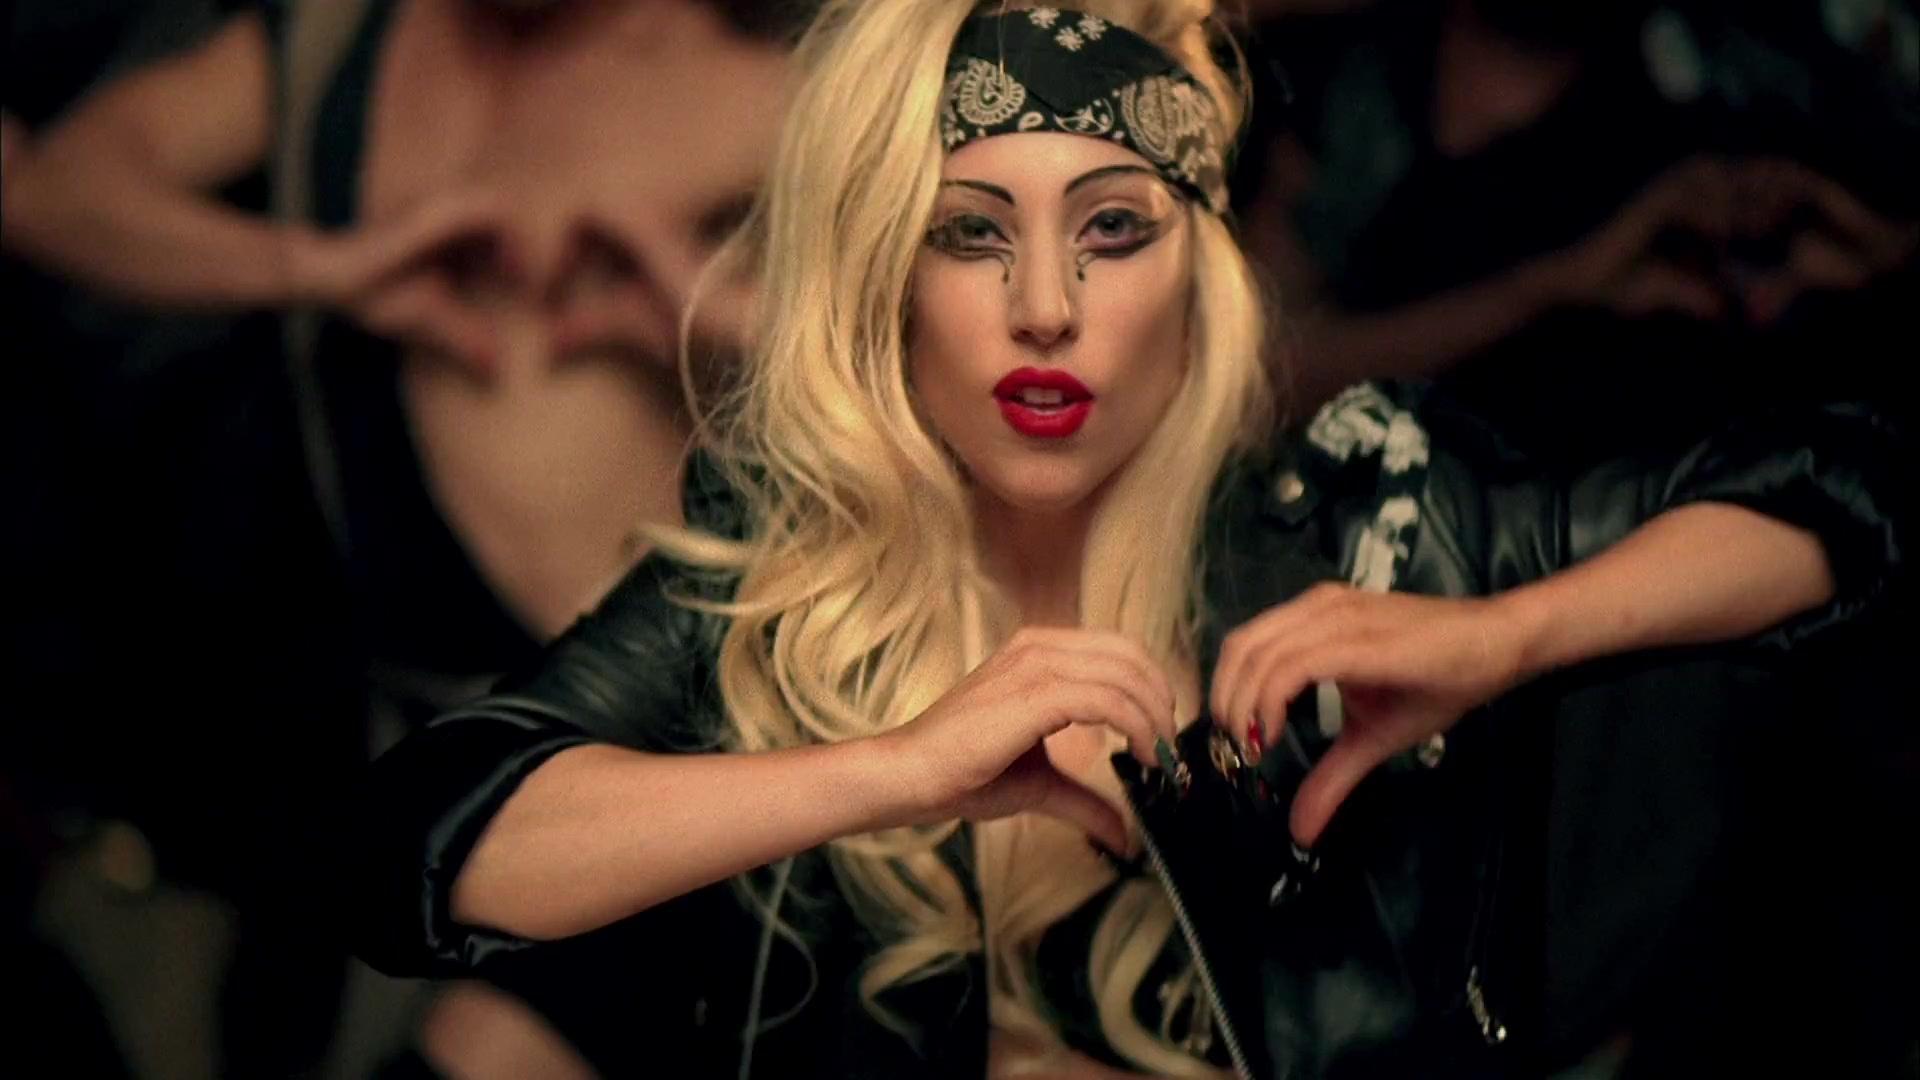 File:lady Gaga Judas 159.jpg